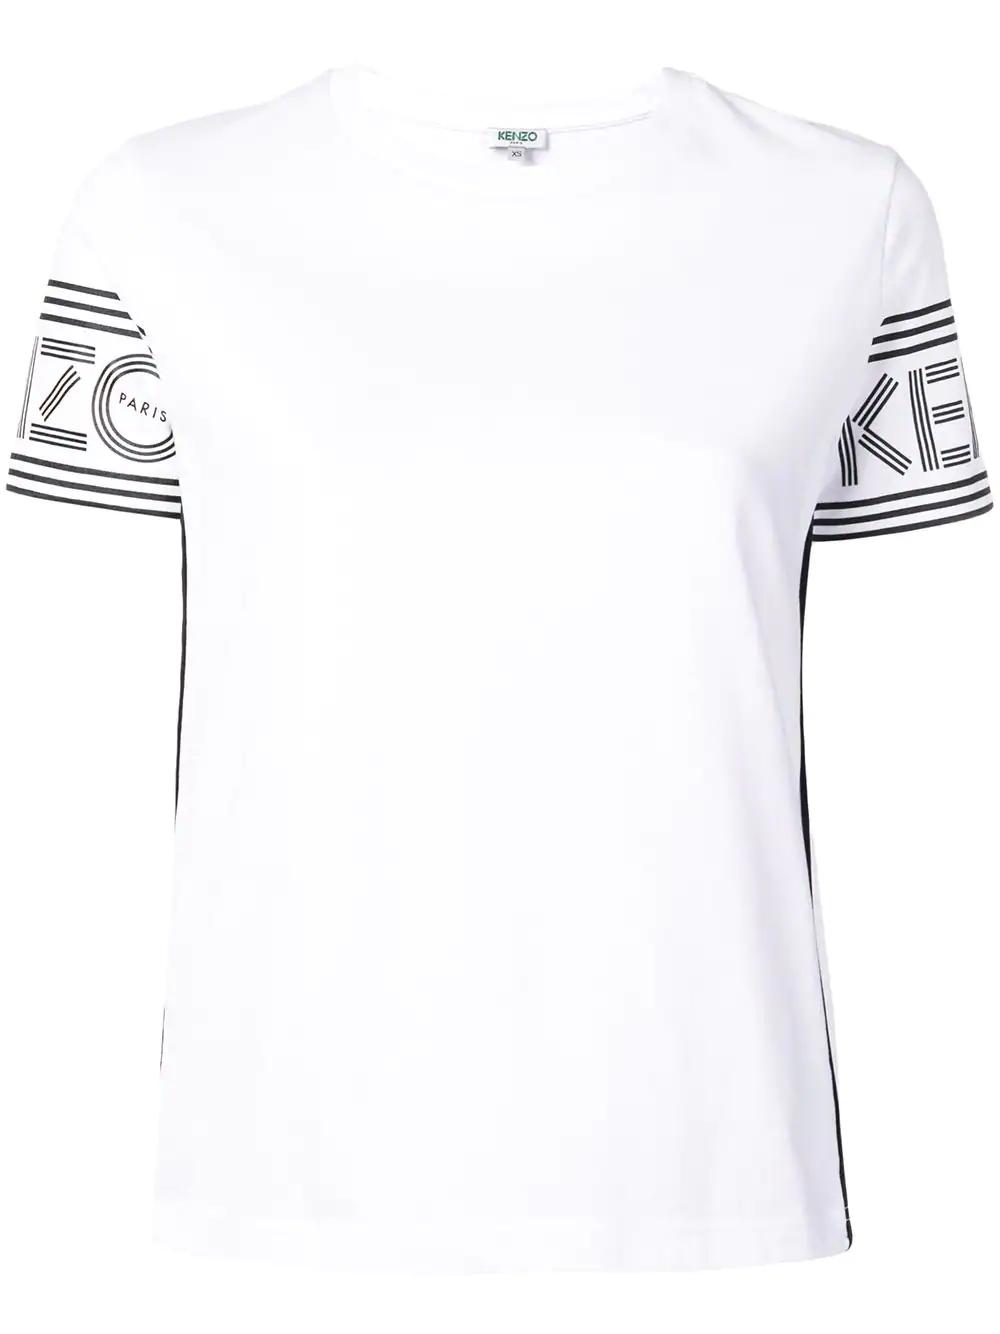 8a46198c187 Kenzo Logo Print T-Shirt - White | ModeSens